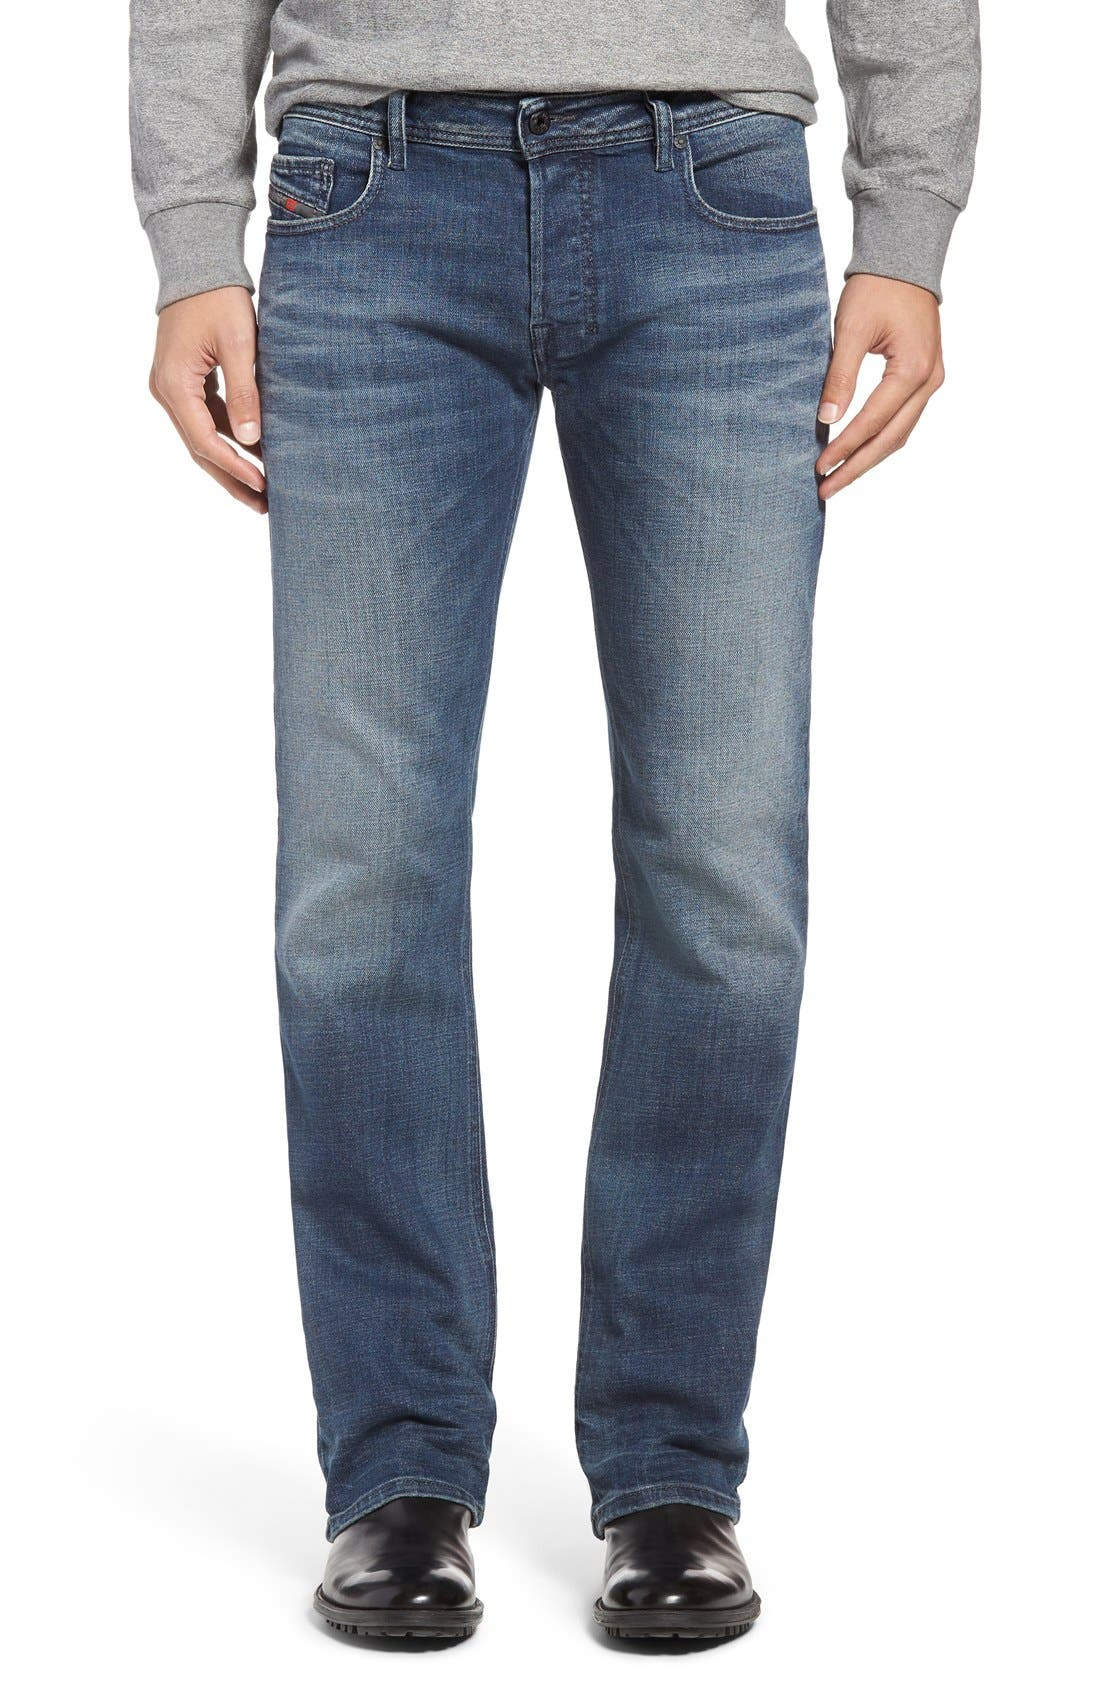 Zatiny Bootcut Jeans,                             Main thumbnail 1, color,                             857N